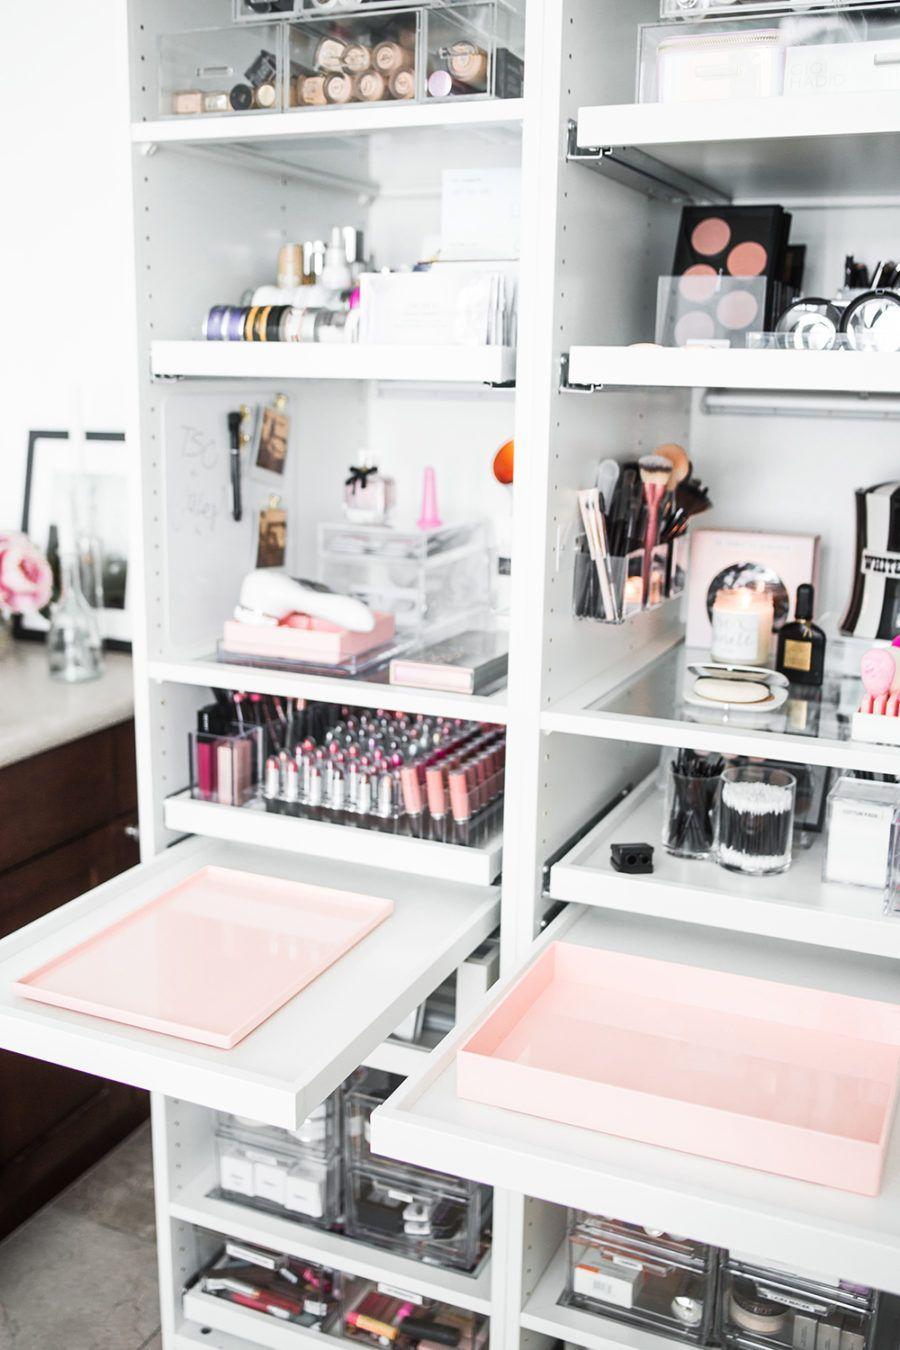 My Makeup Installment And Organization Ft Deuxaliti